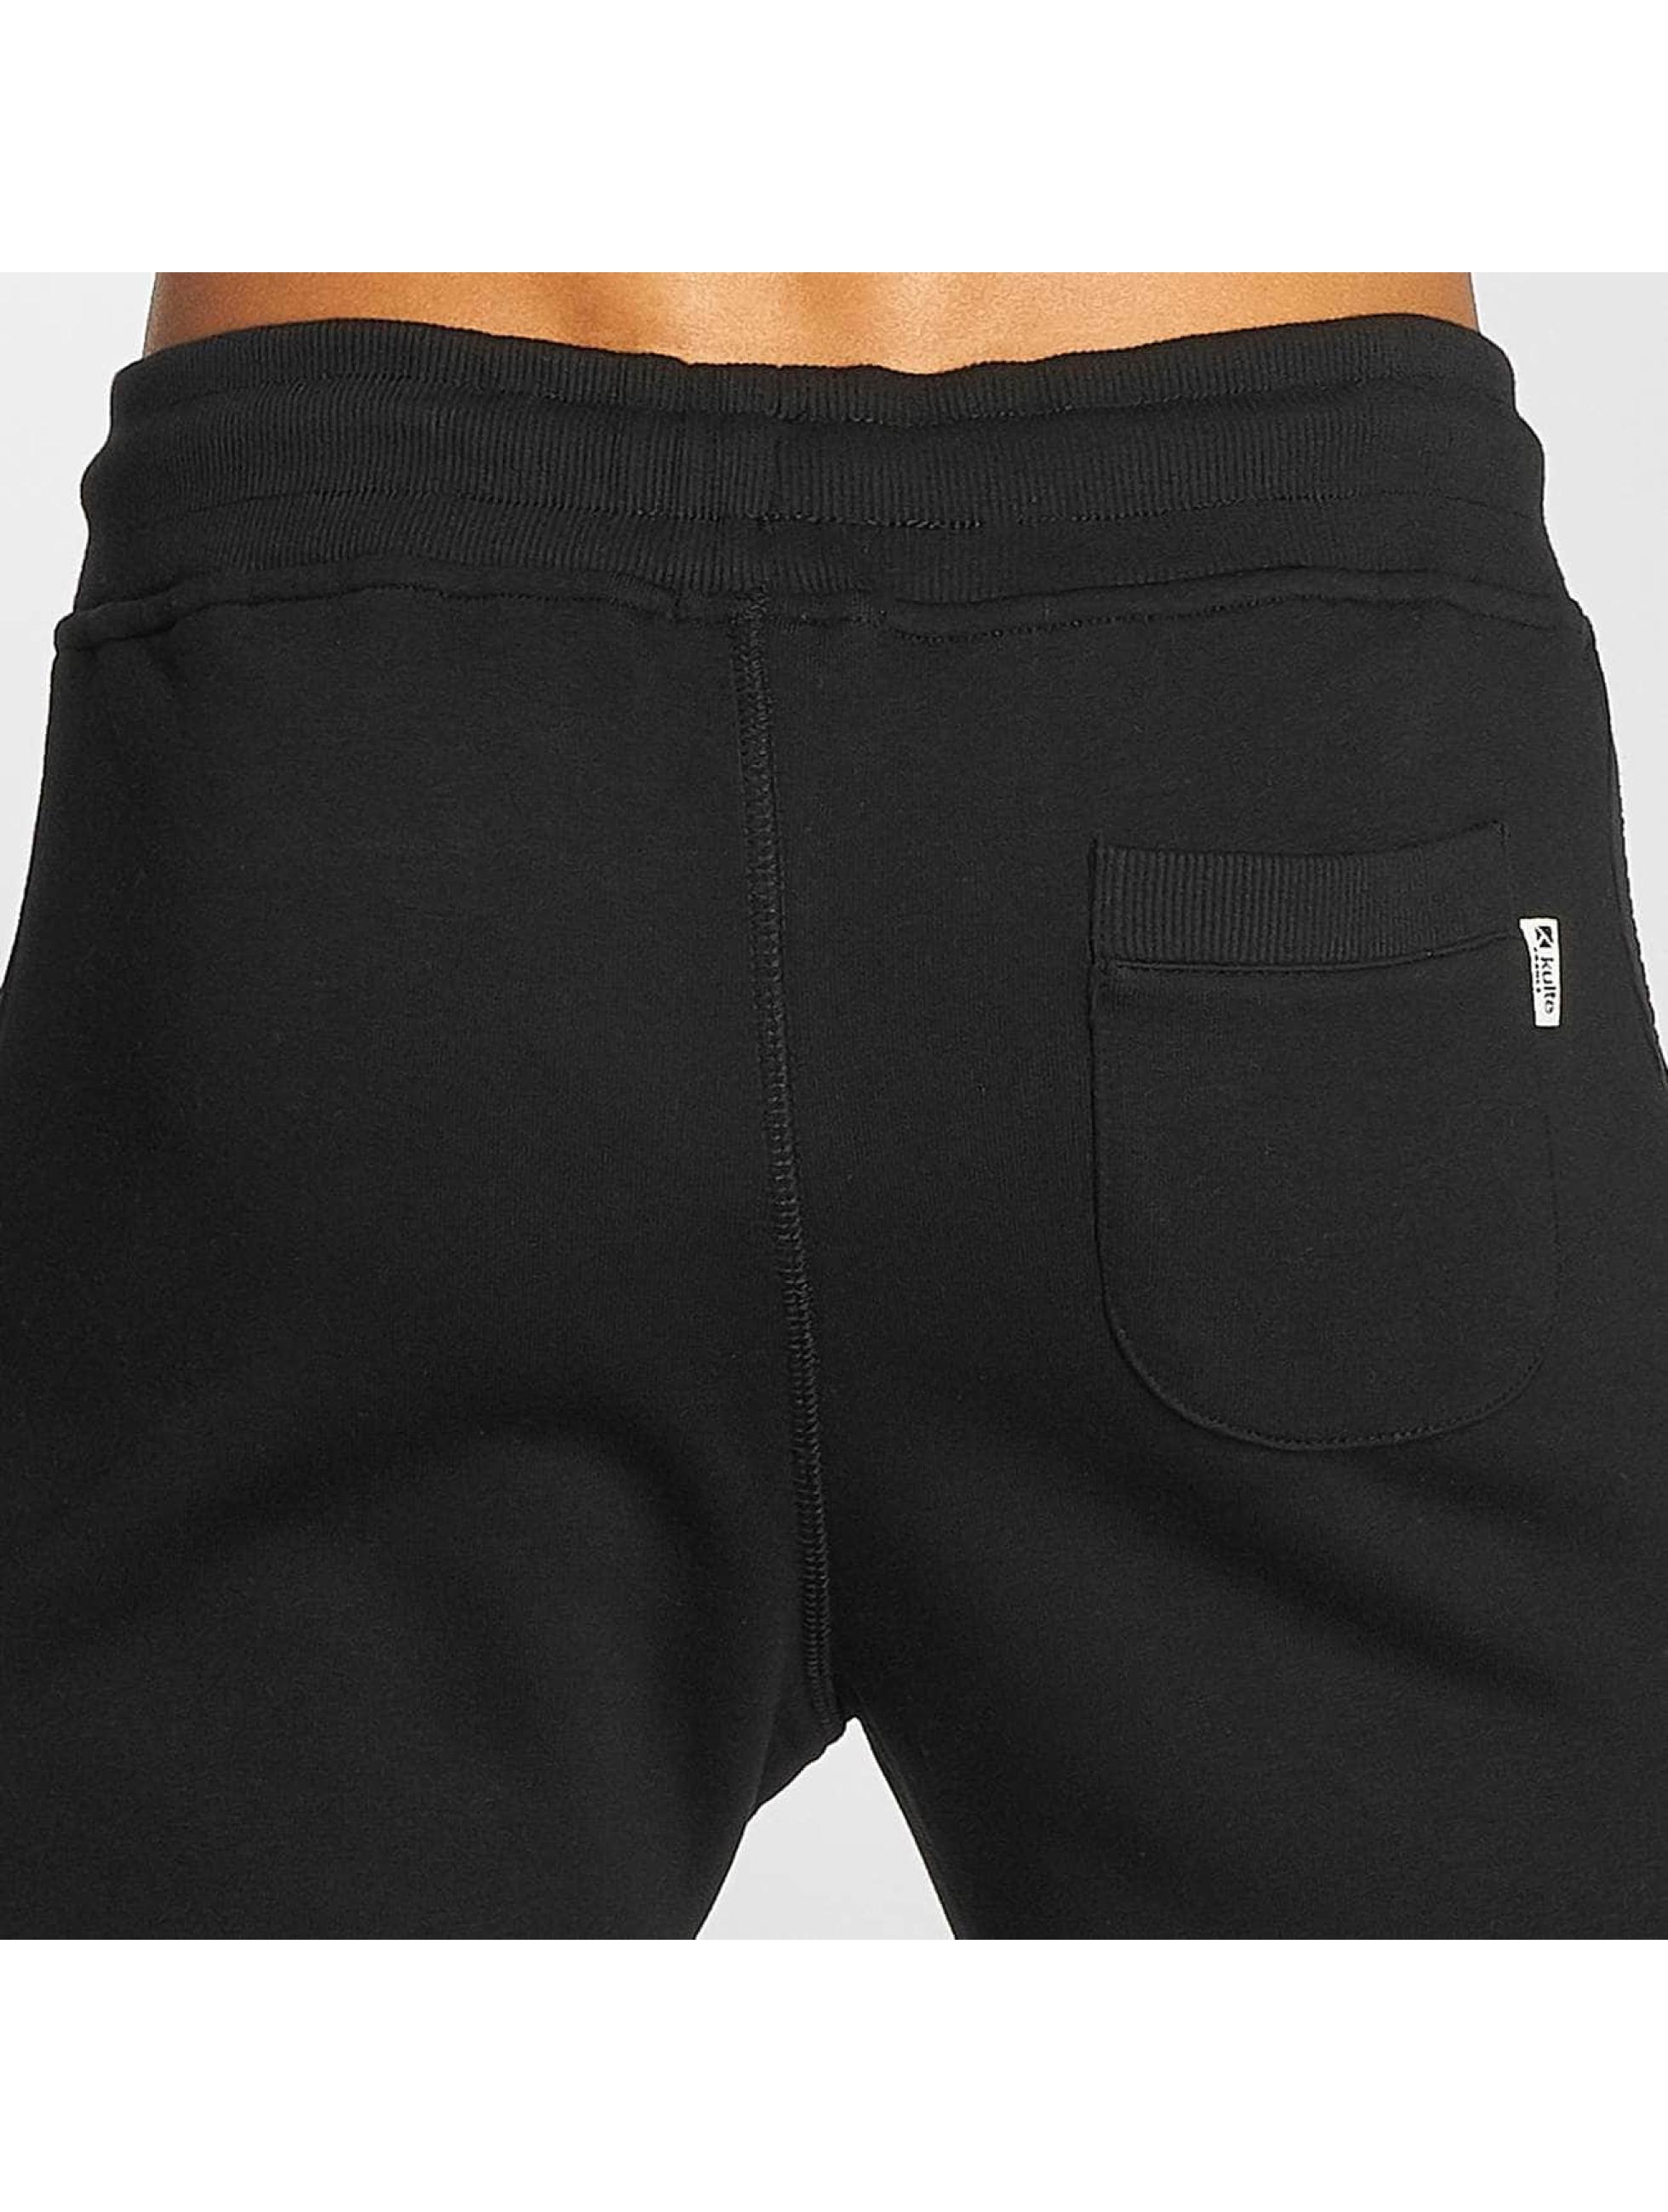 Kulte joggingbroek Jog Sweat zwart